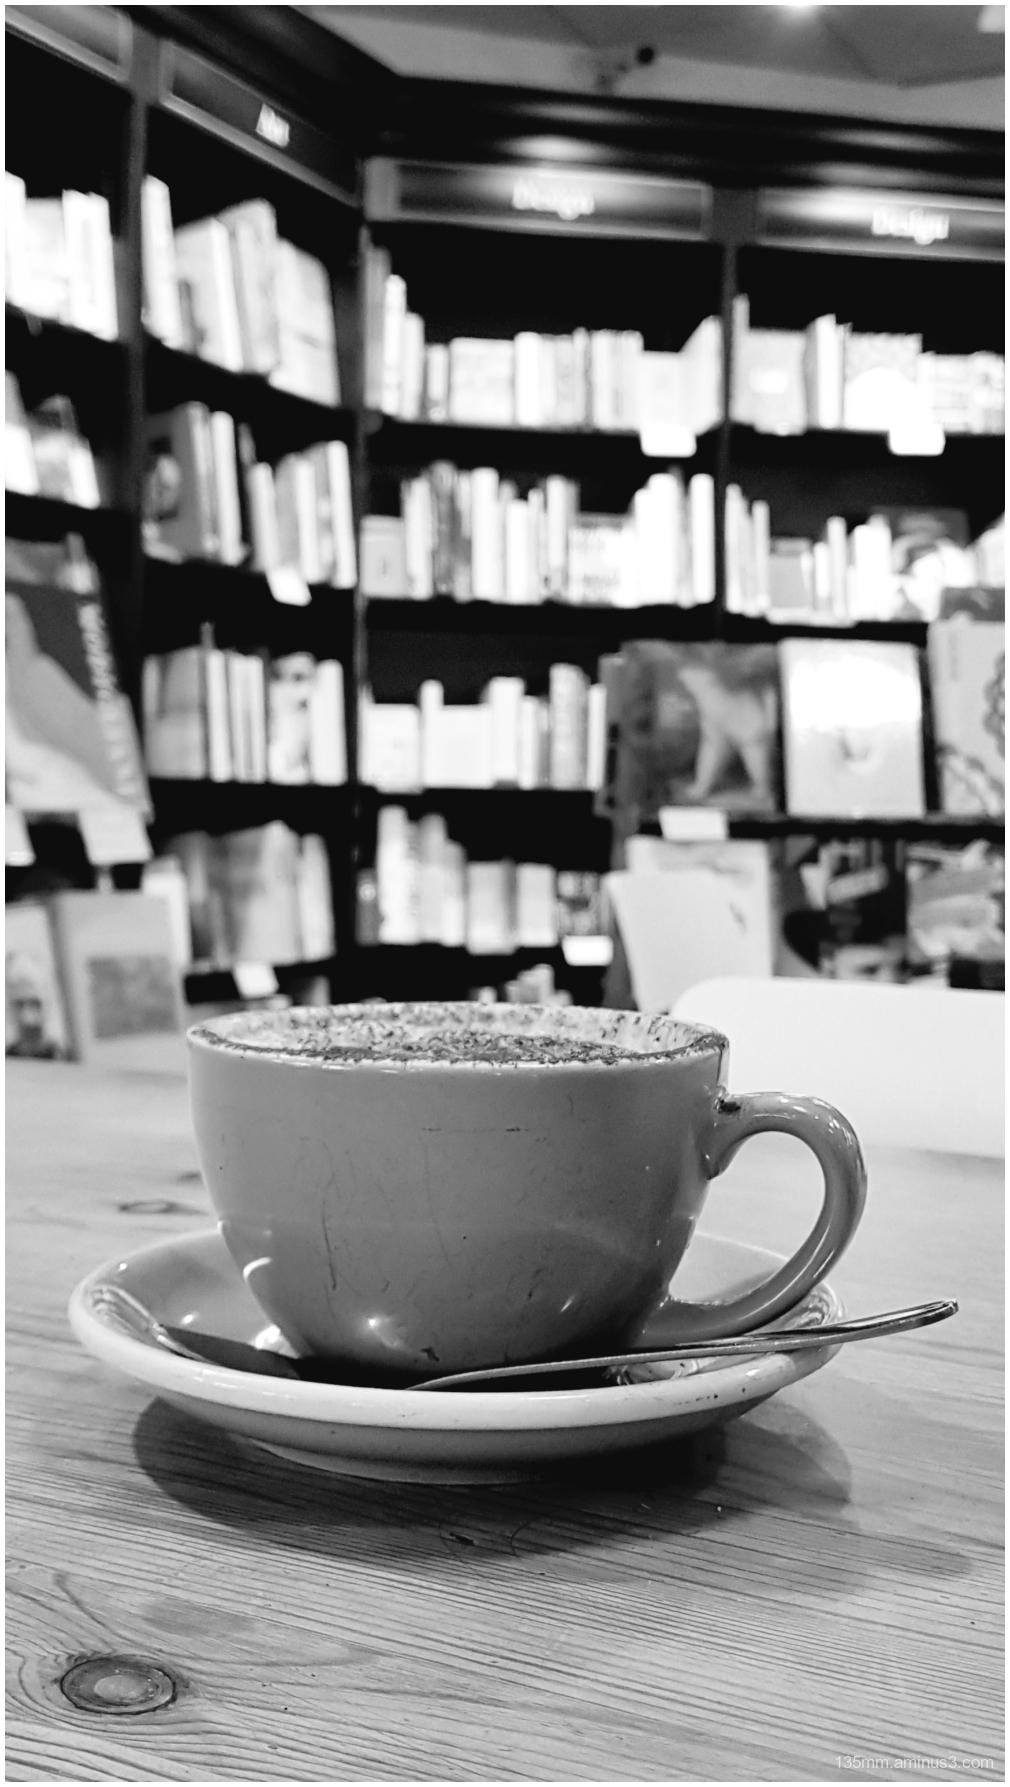 Waterstones bookshop- Brighton. East Sussex U.K